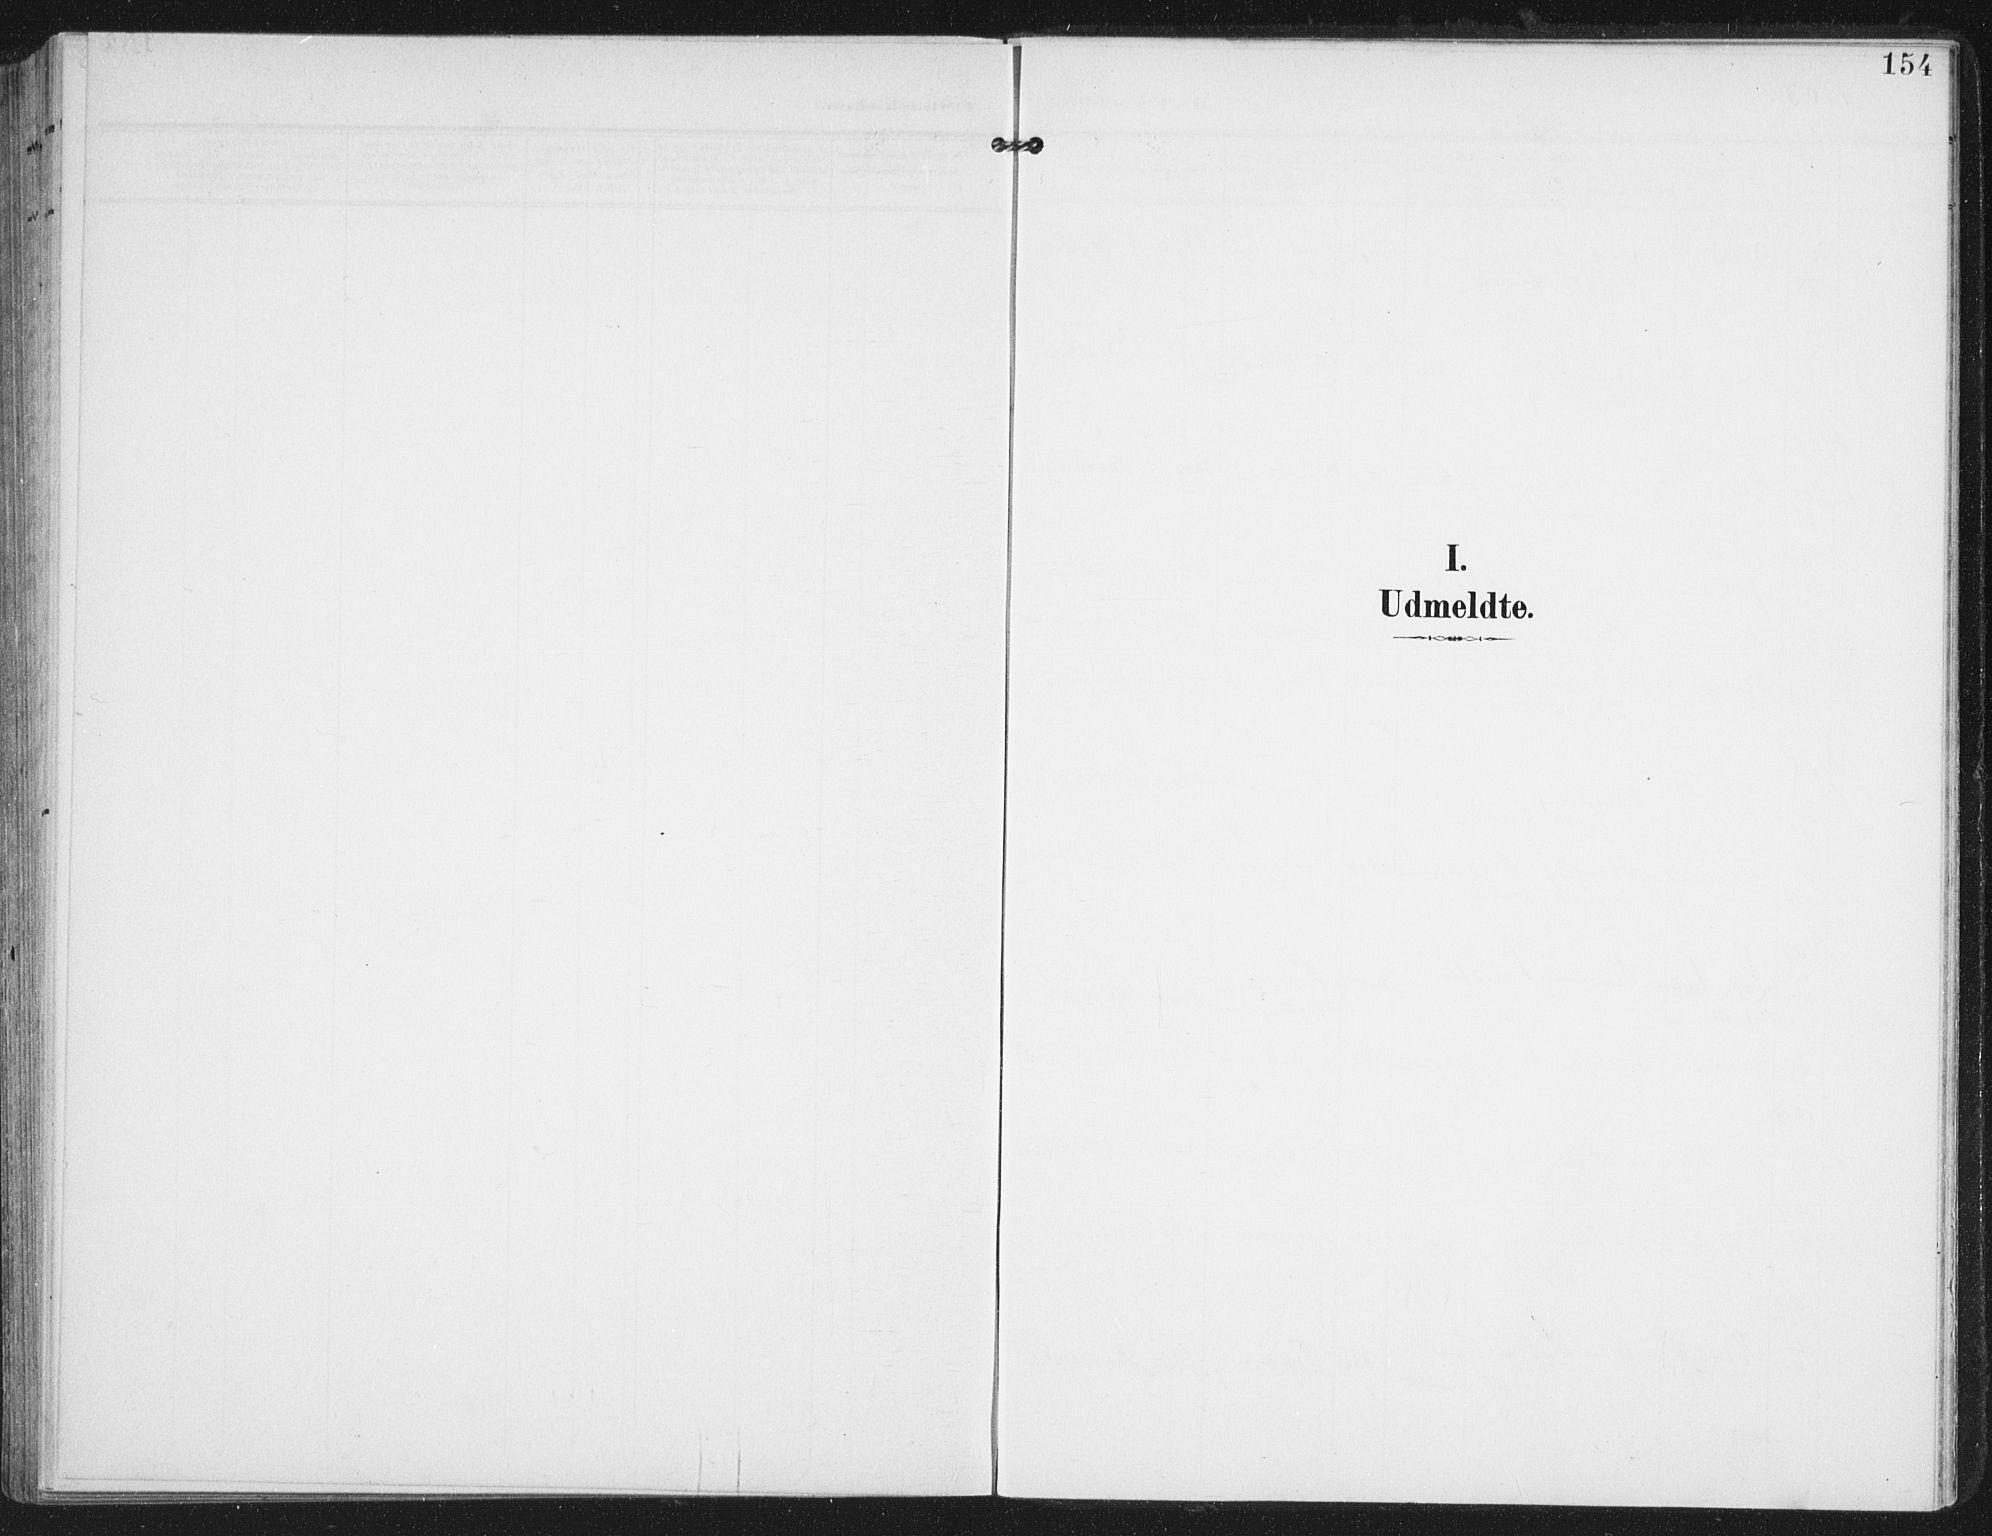 SAT, Ministerialprotokoller, klokkerbøker og fødselsregistre - Nordland, 886/L1221: Ministerialbok nr. 886A03, 1903-1913, s. 154